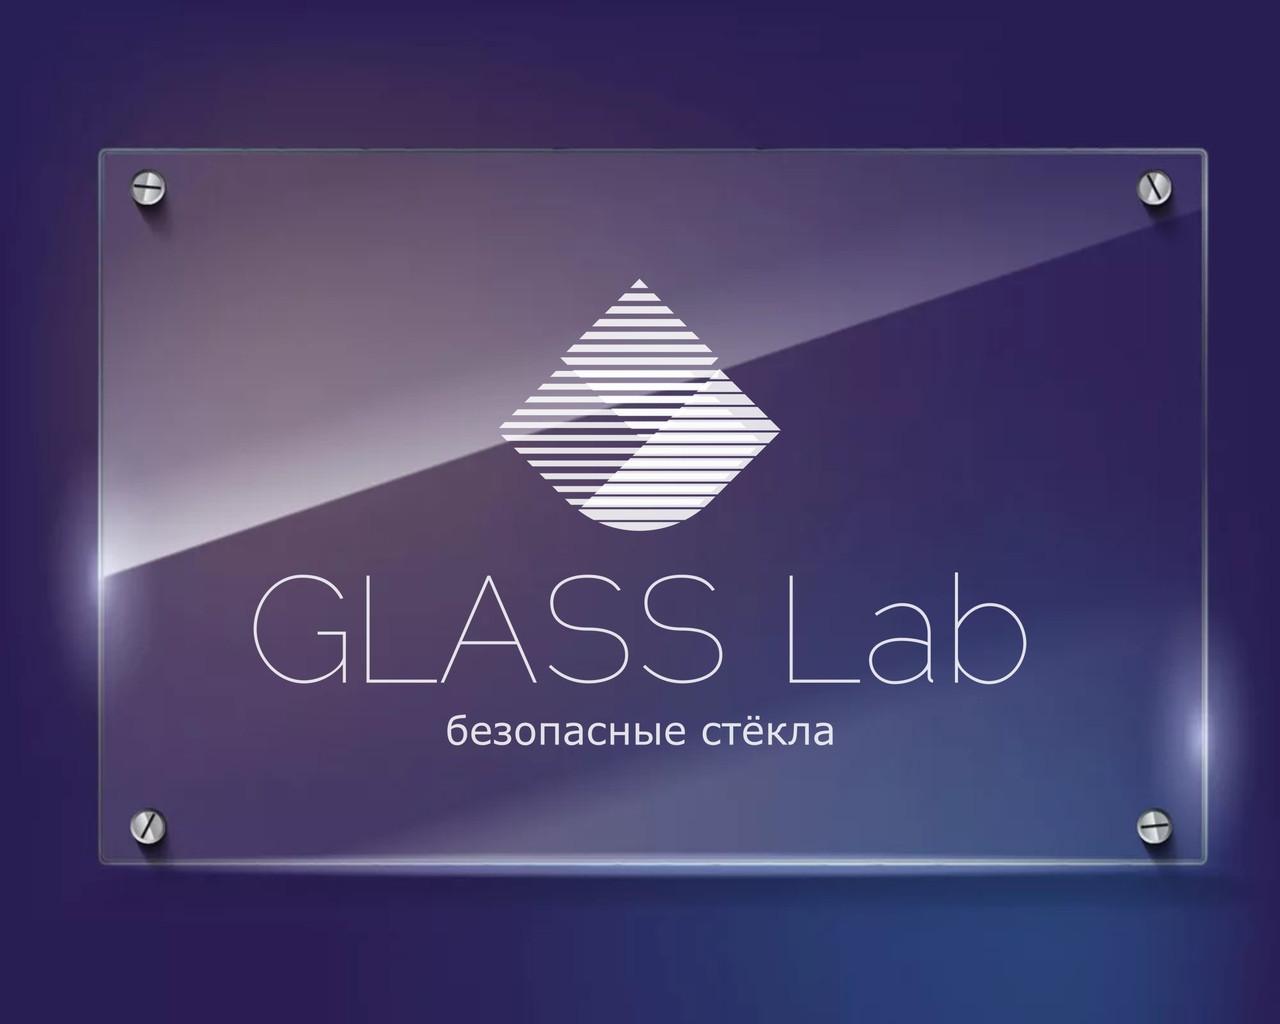 _CLASS Lab_ (Кишинёв)